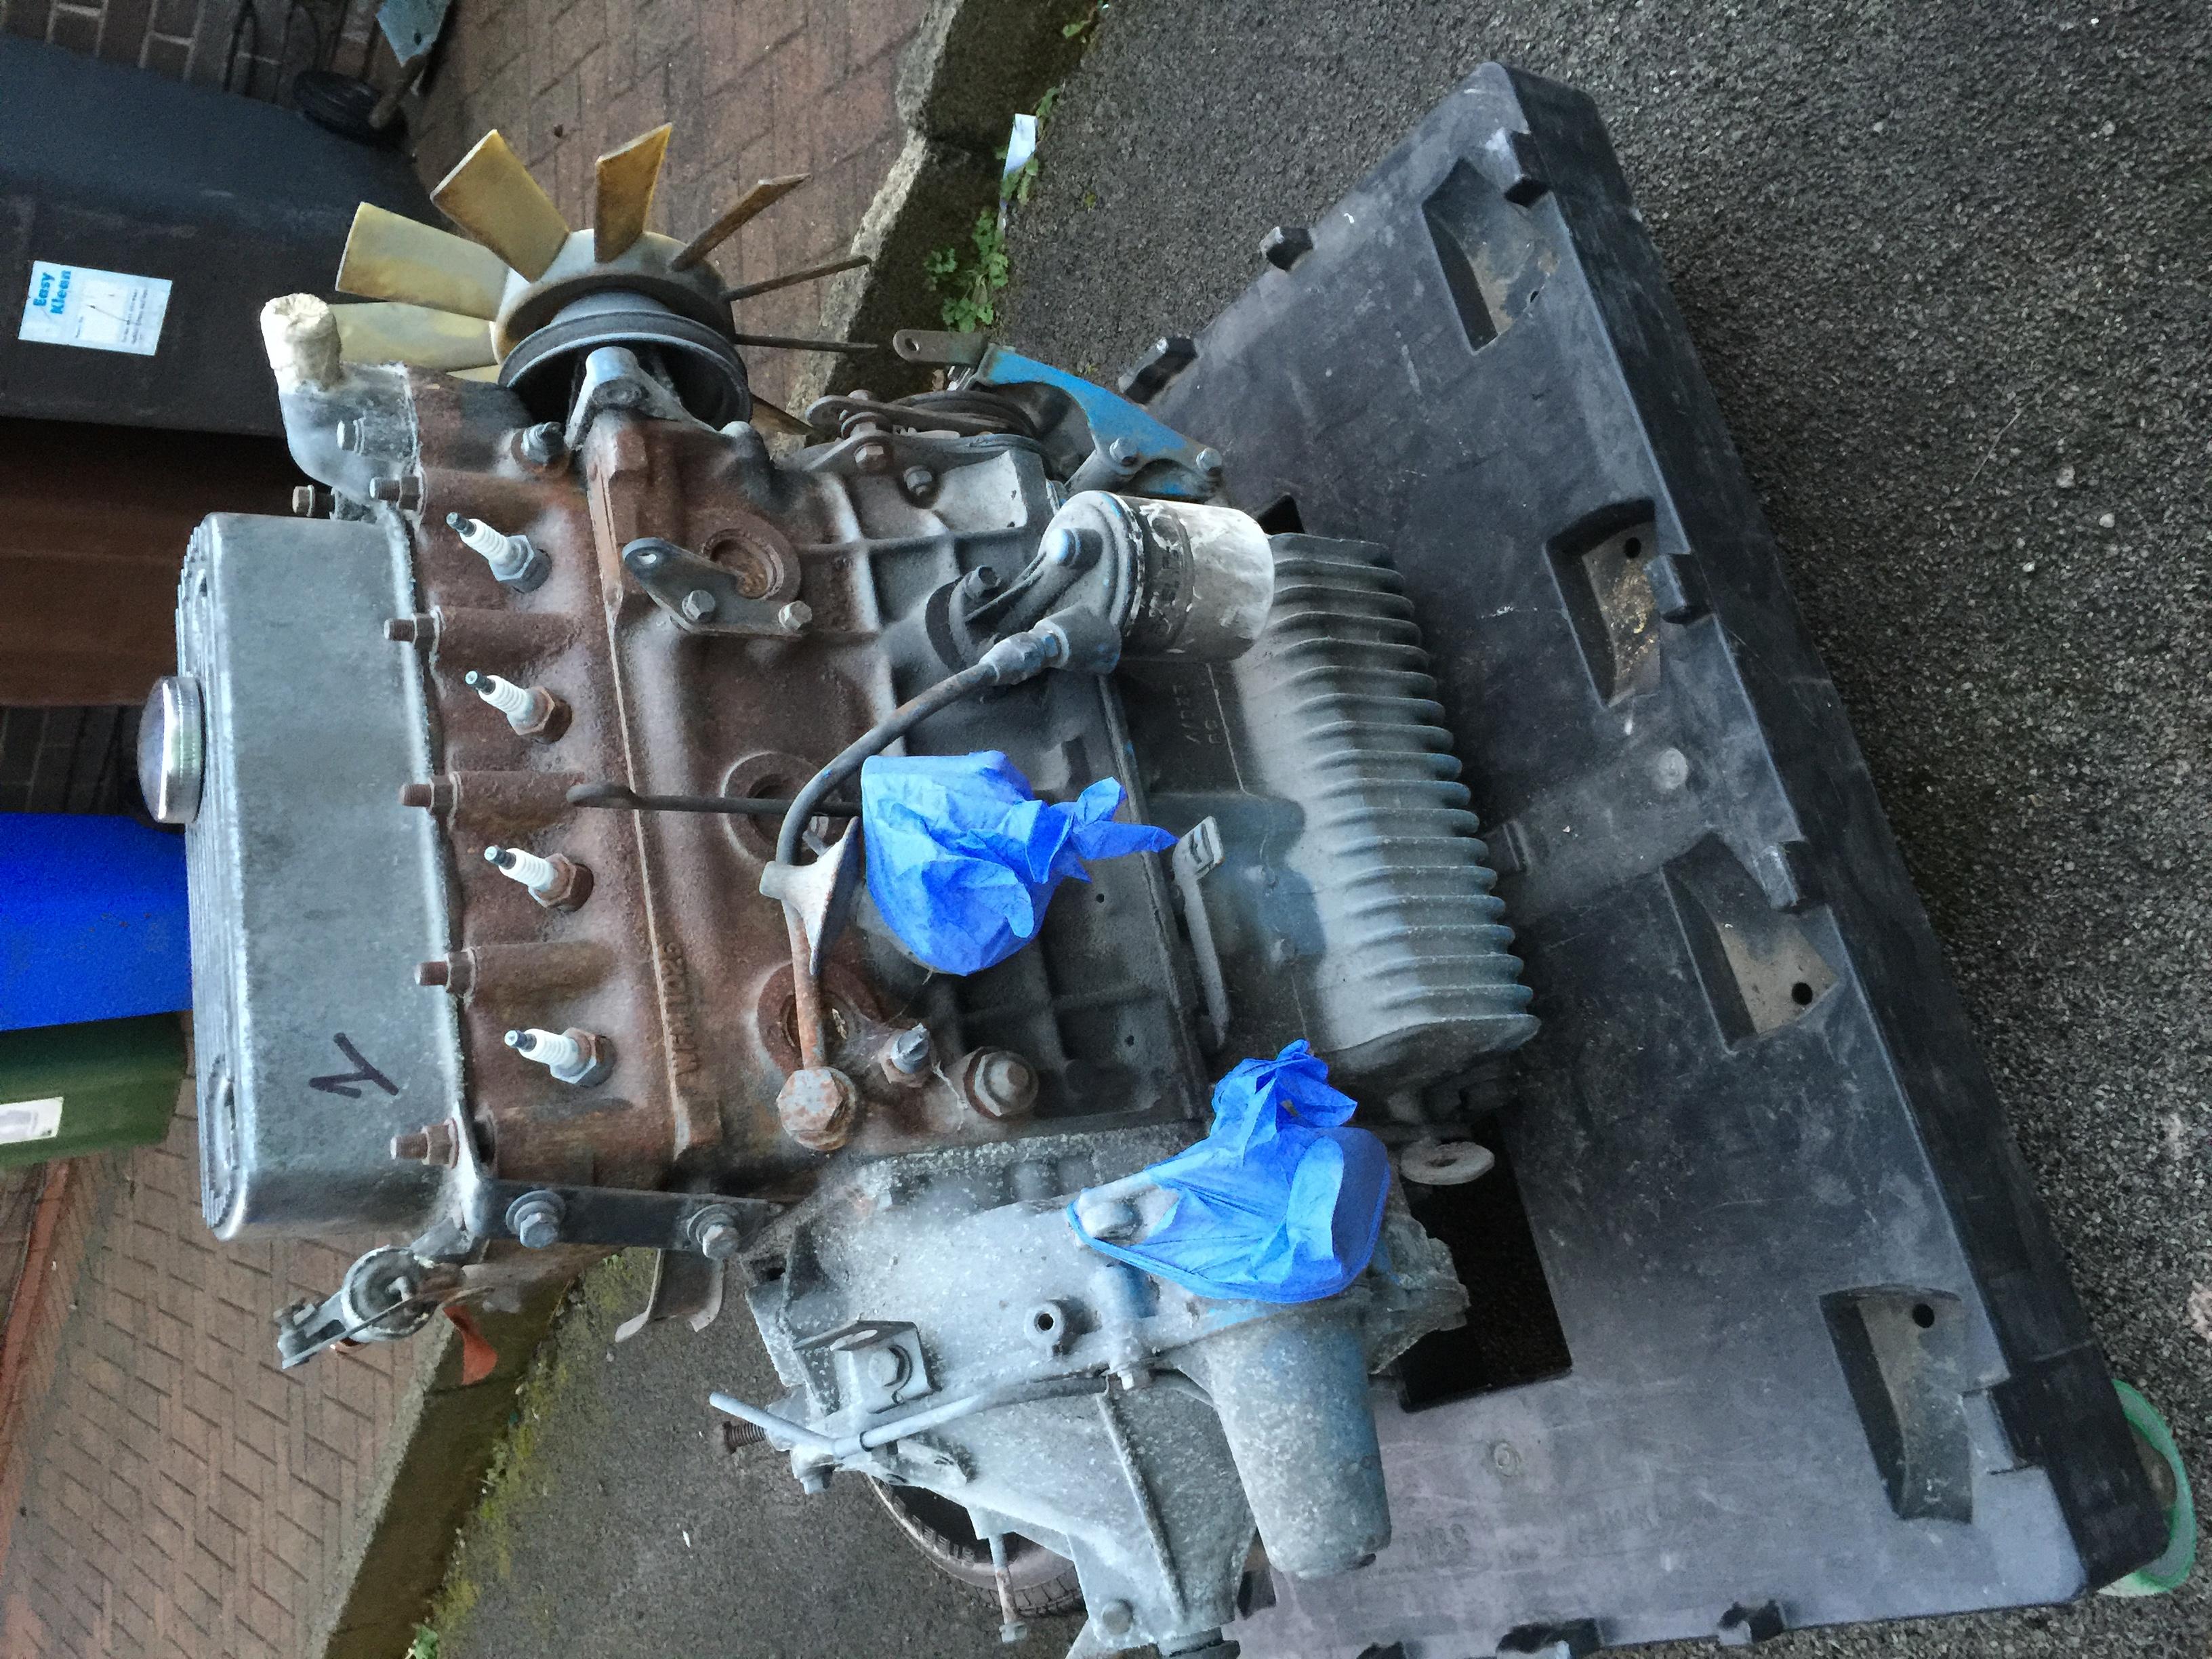 EEEWWW Engine!